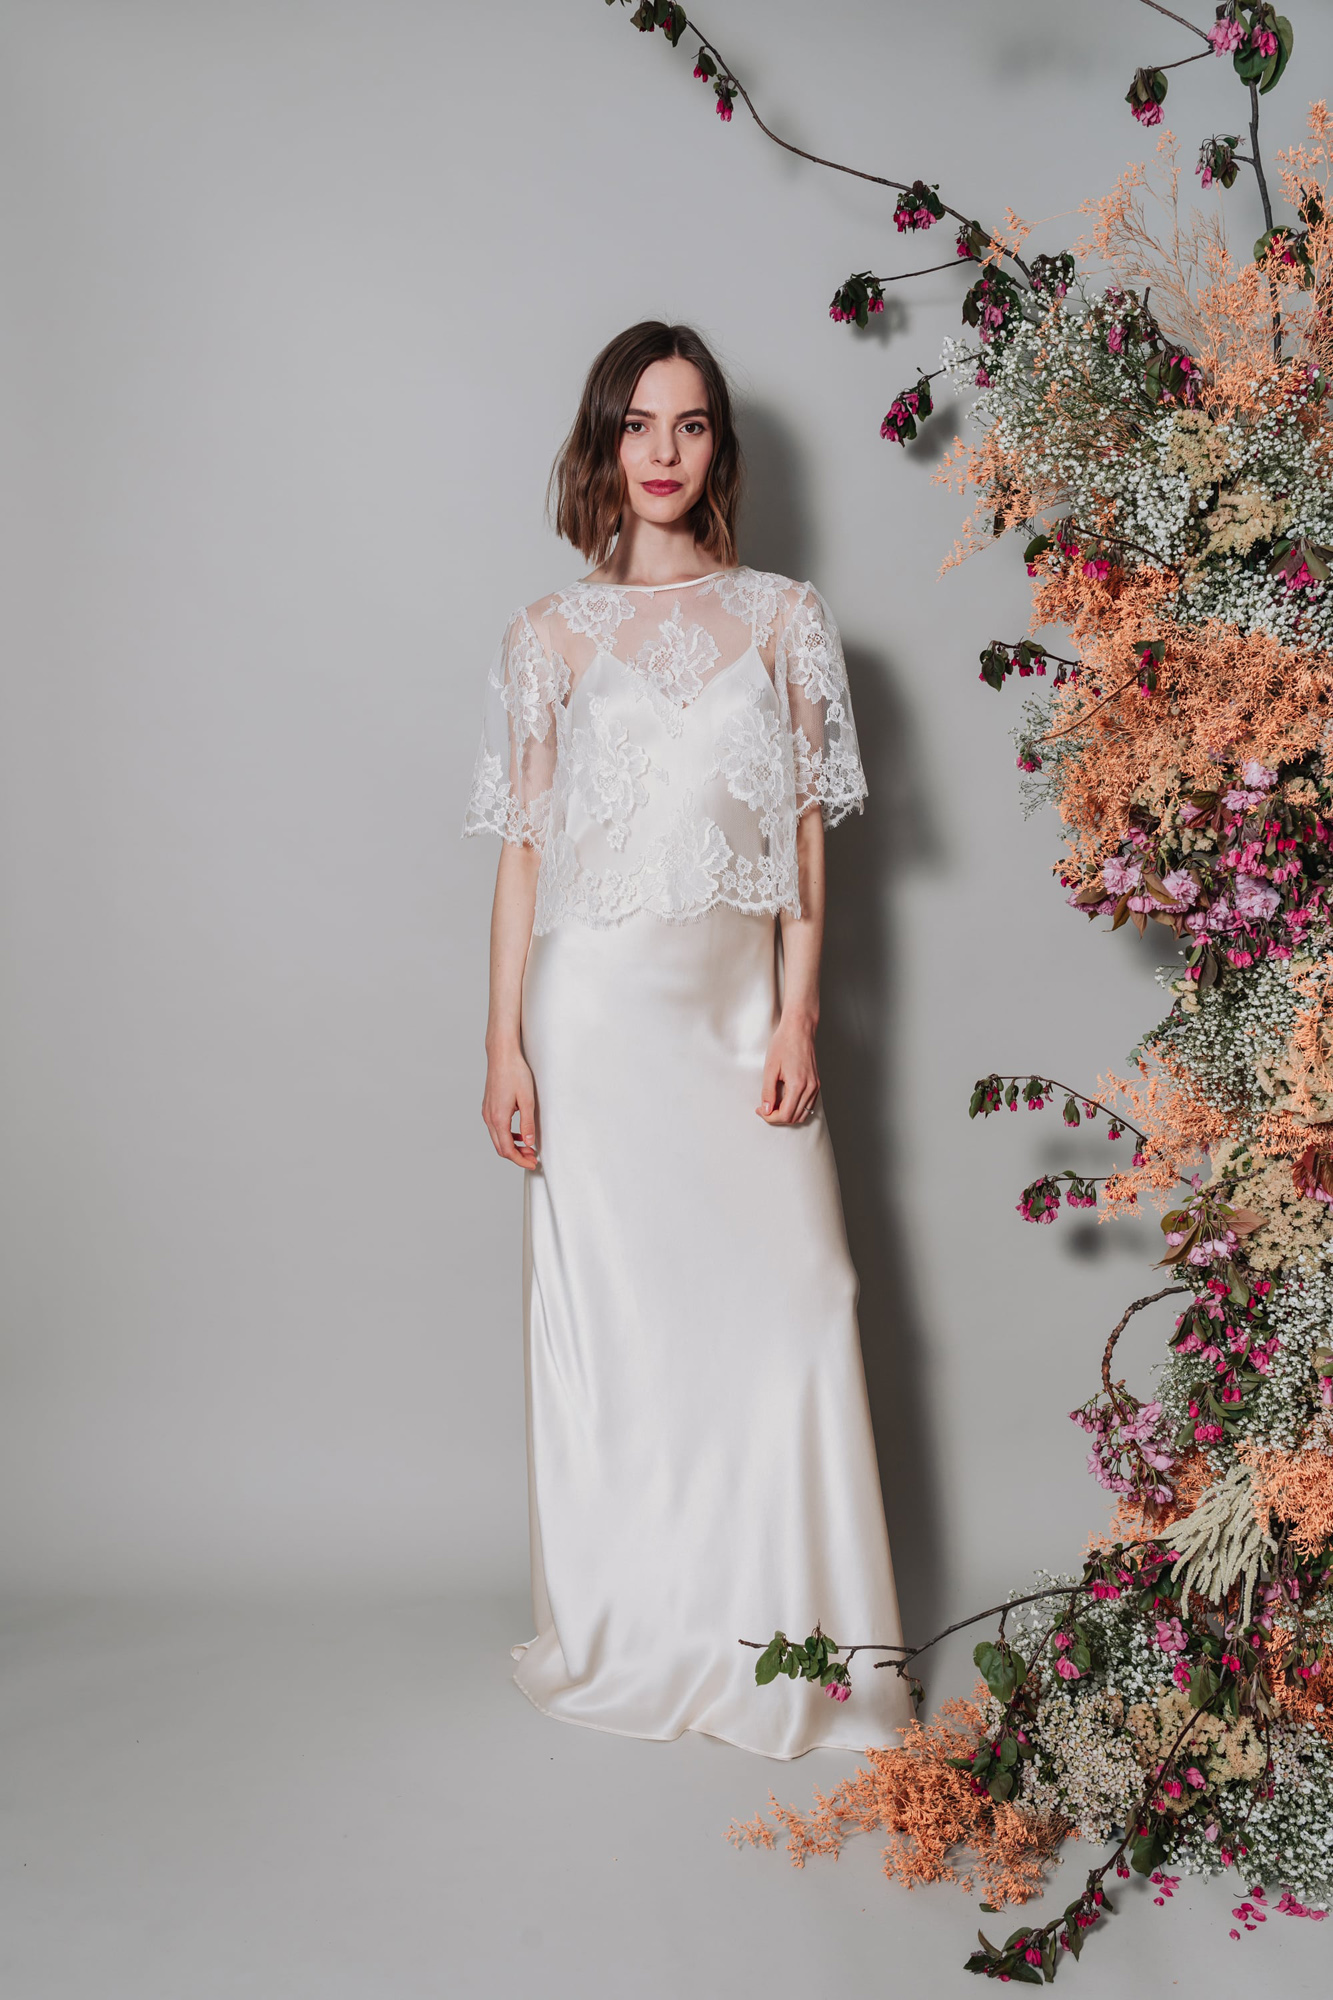 Kate-Beaumont-Sheffield-Rosa-Floral-Lace-Jacket-Camellia-Bias-Cut-Silk-Wedding-Gown-1.jpg